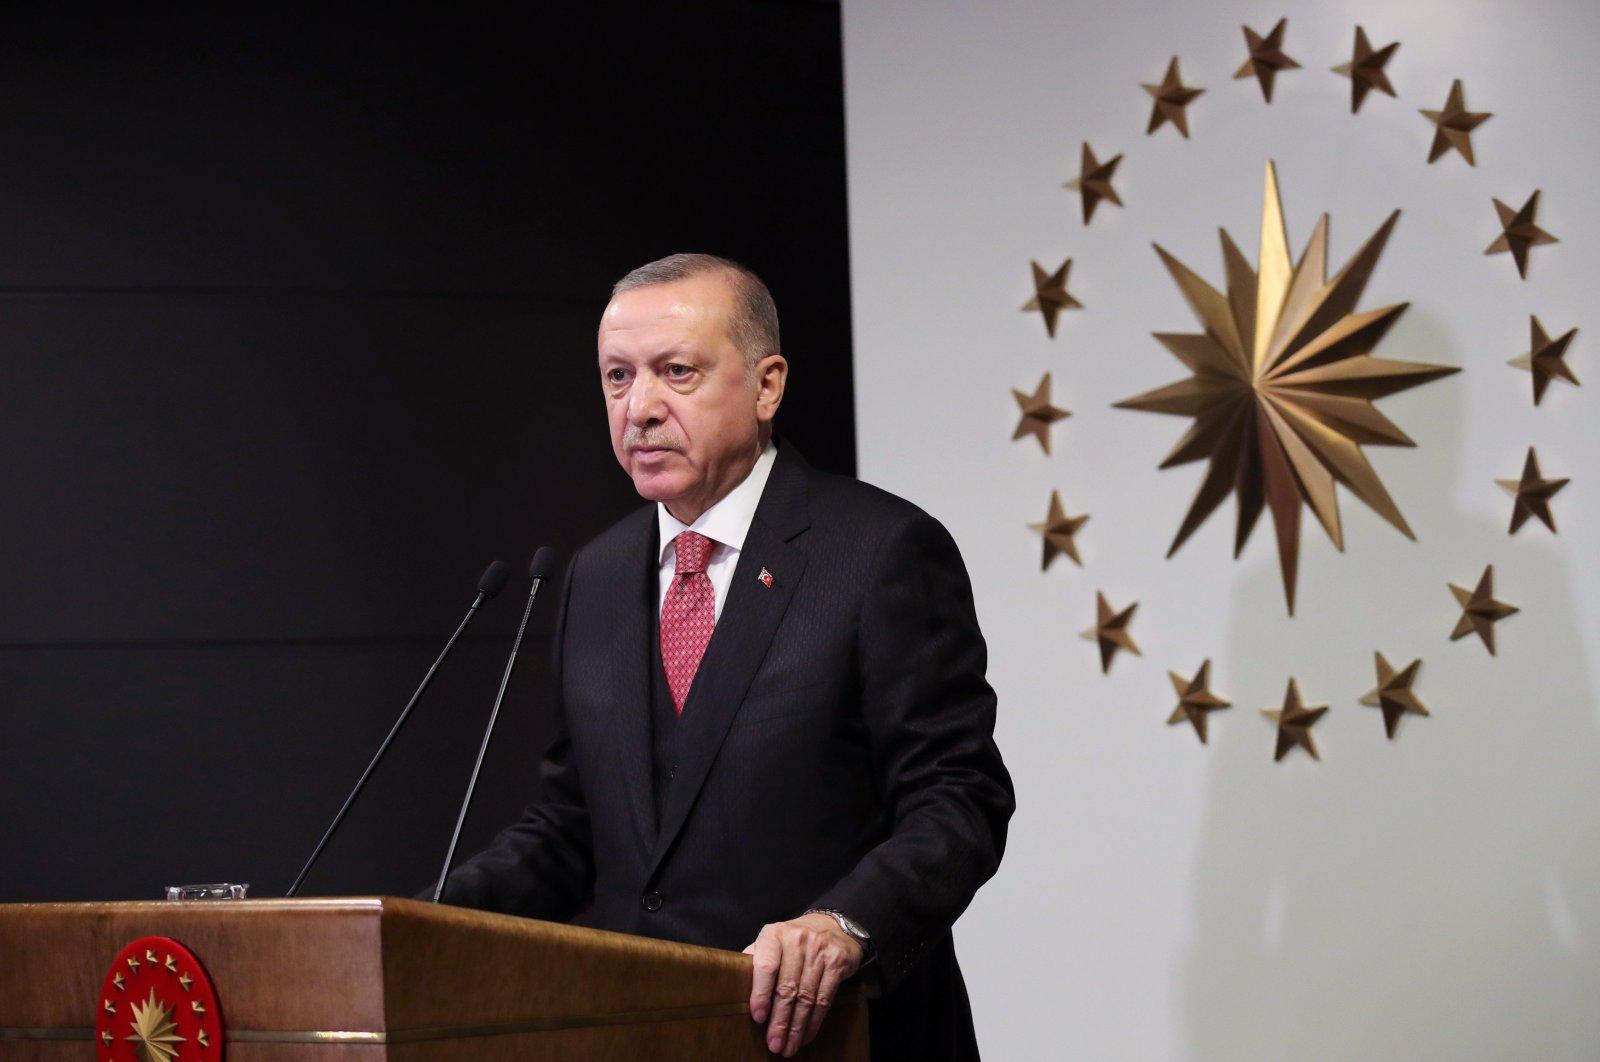 President Recep Tayyip Erdoğan speaks after a Cabinet meeting, Ankara, Turkey, April 22, 2020. (AA Photo)